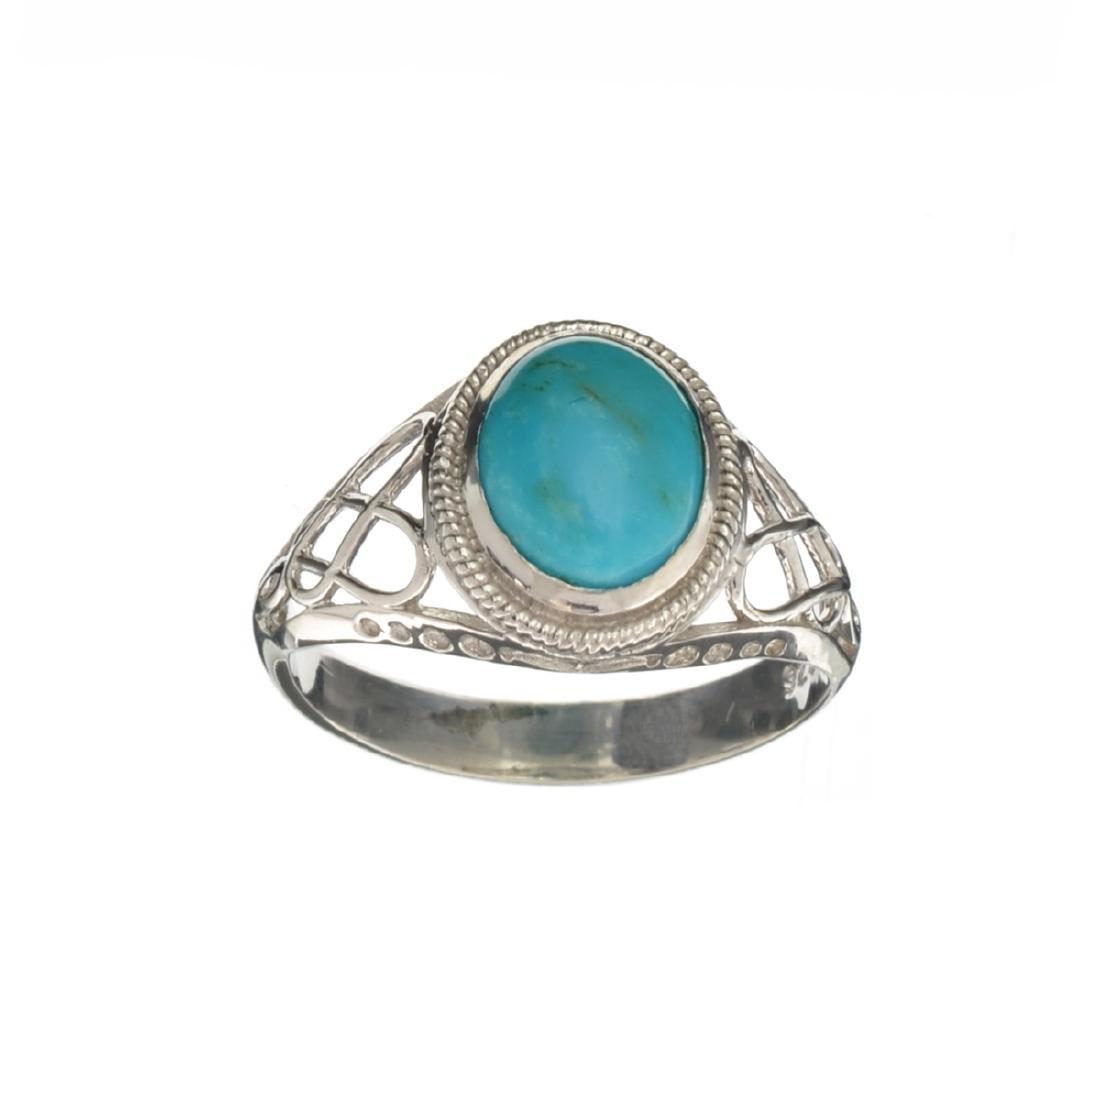 APP: 0.3k Fine Jewelry 1.94CT Cabochon Cut Blue